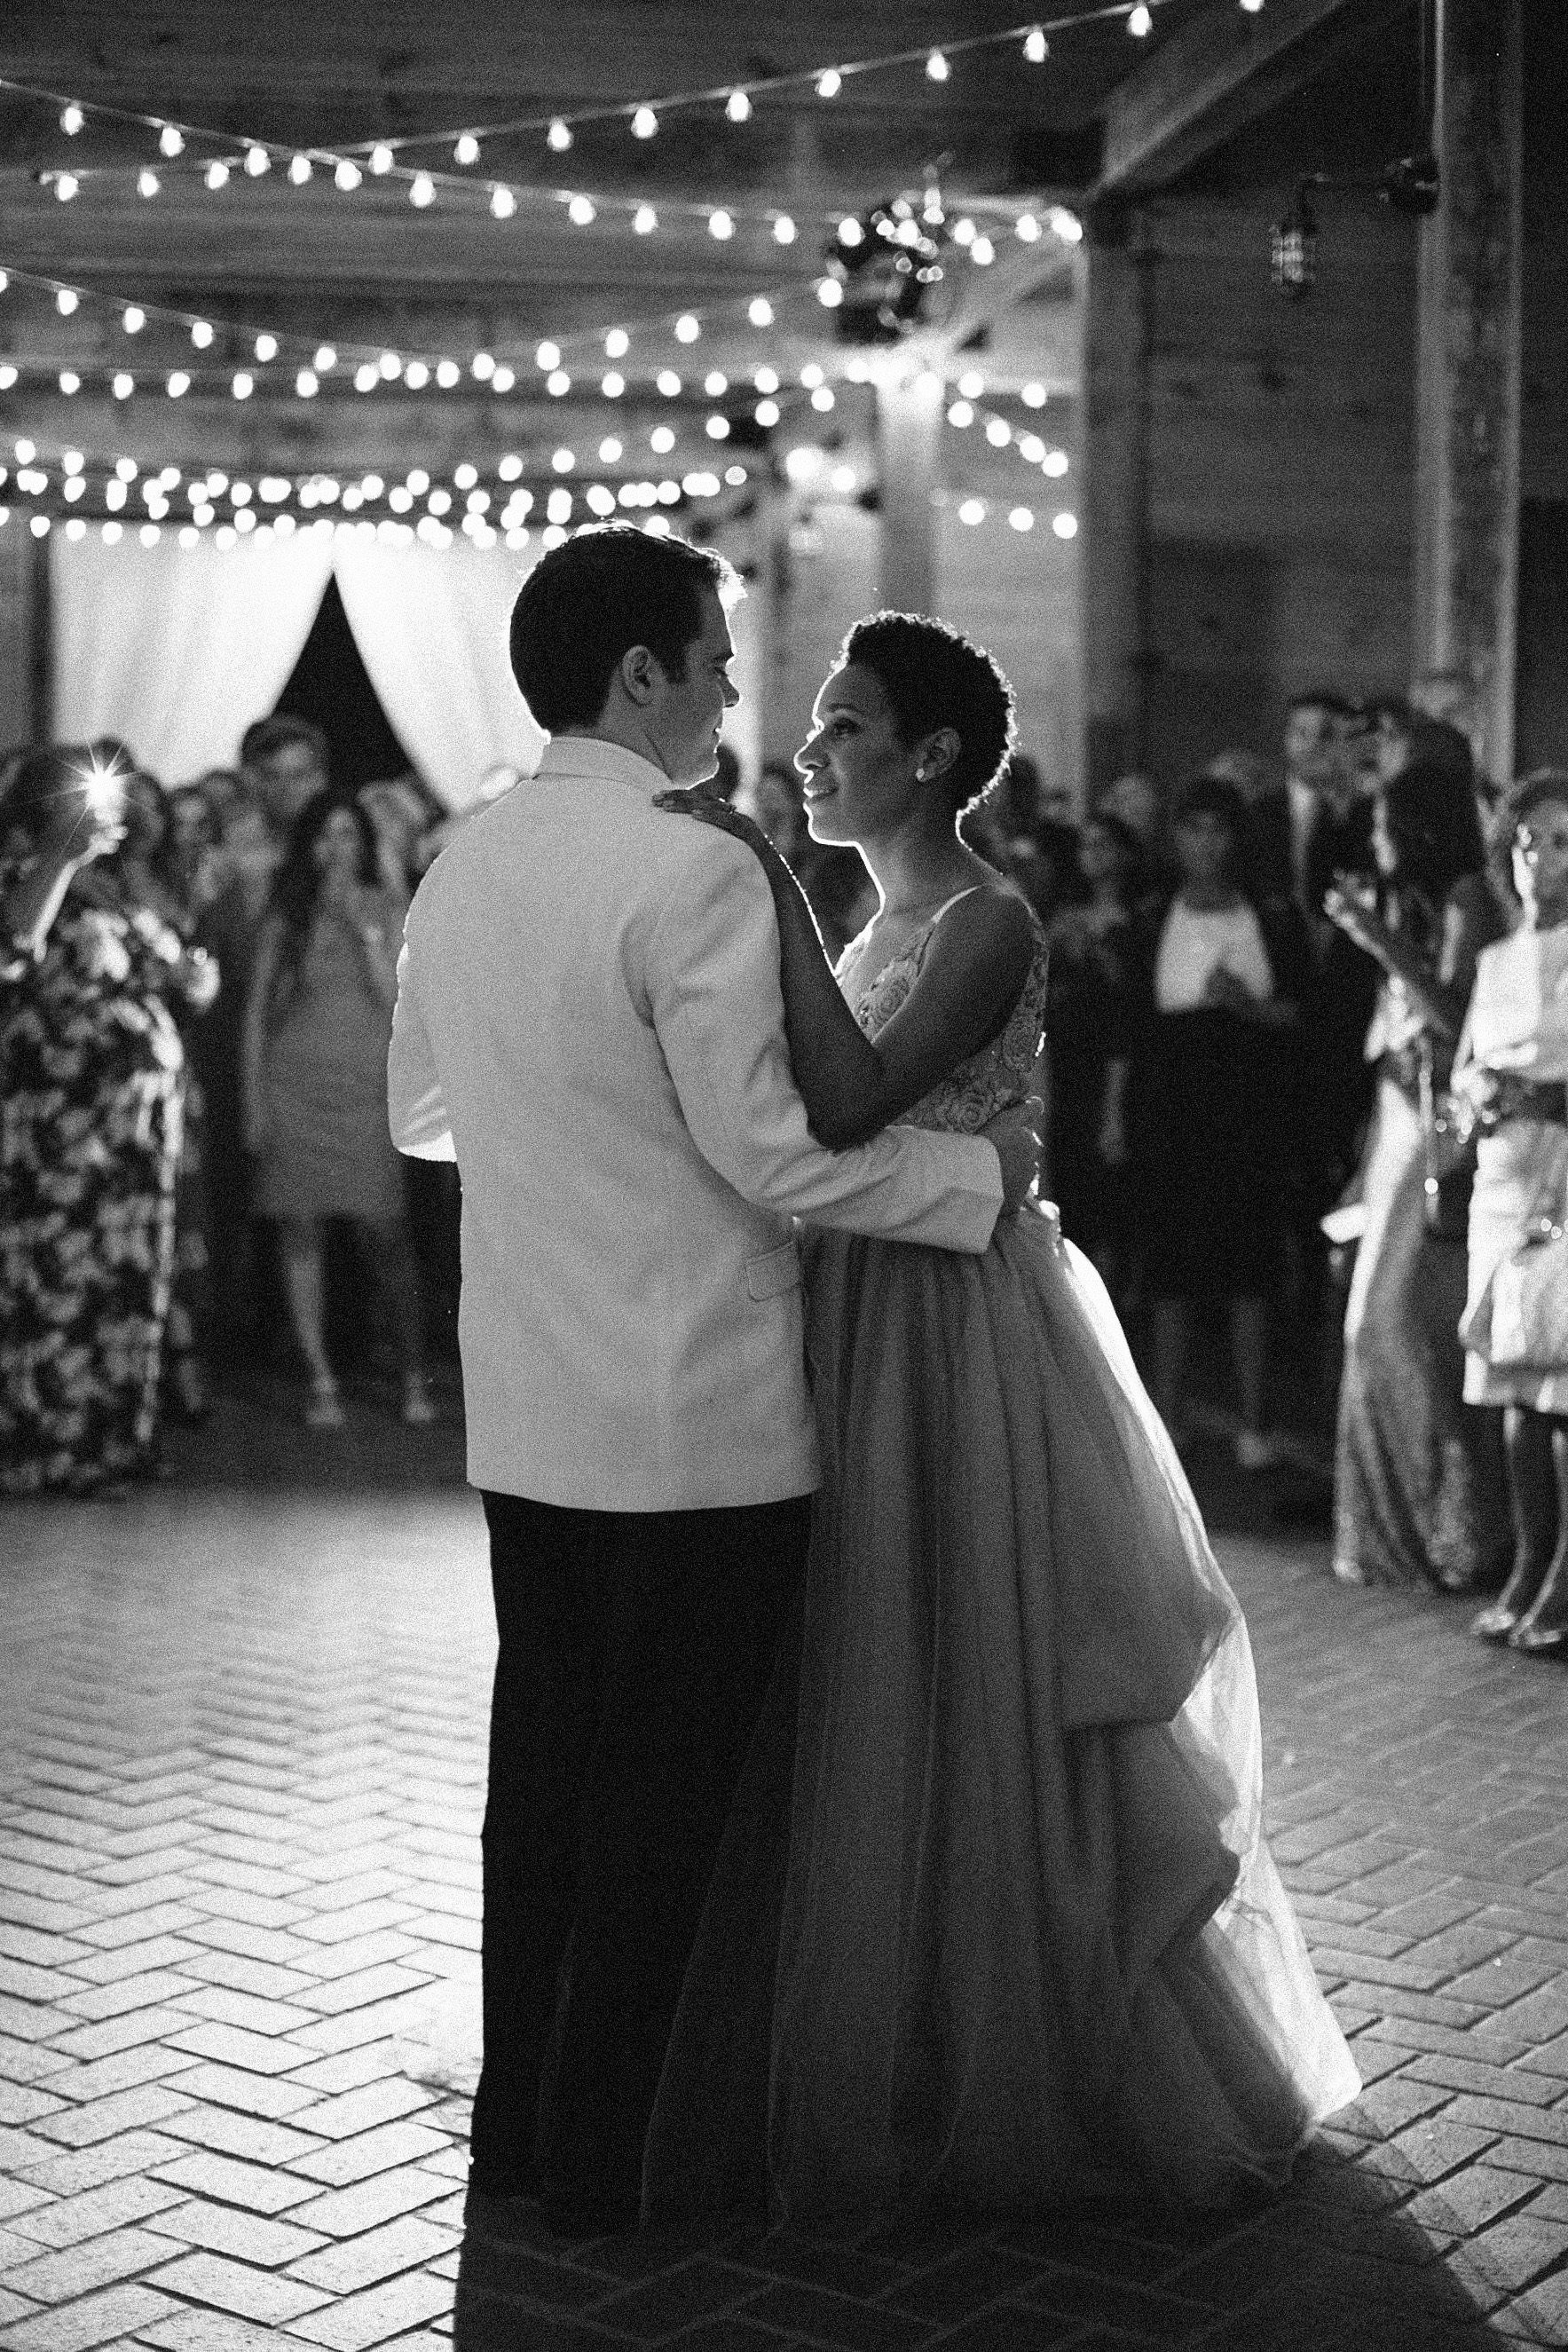 amanda william wedding tennessee first dance black and white